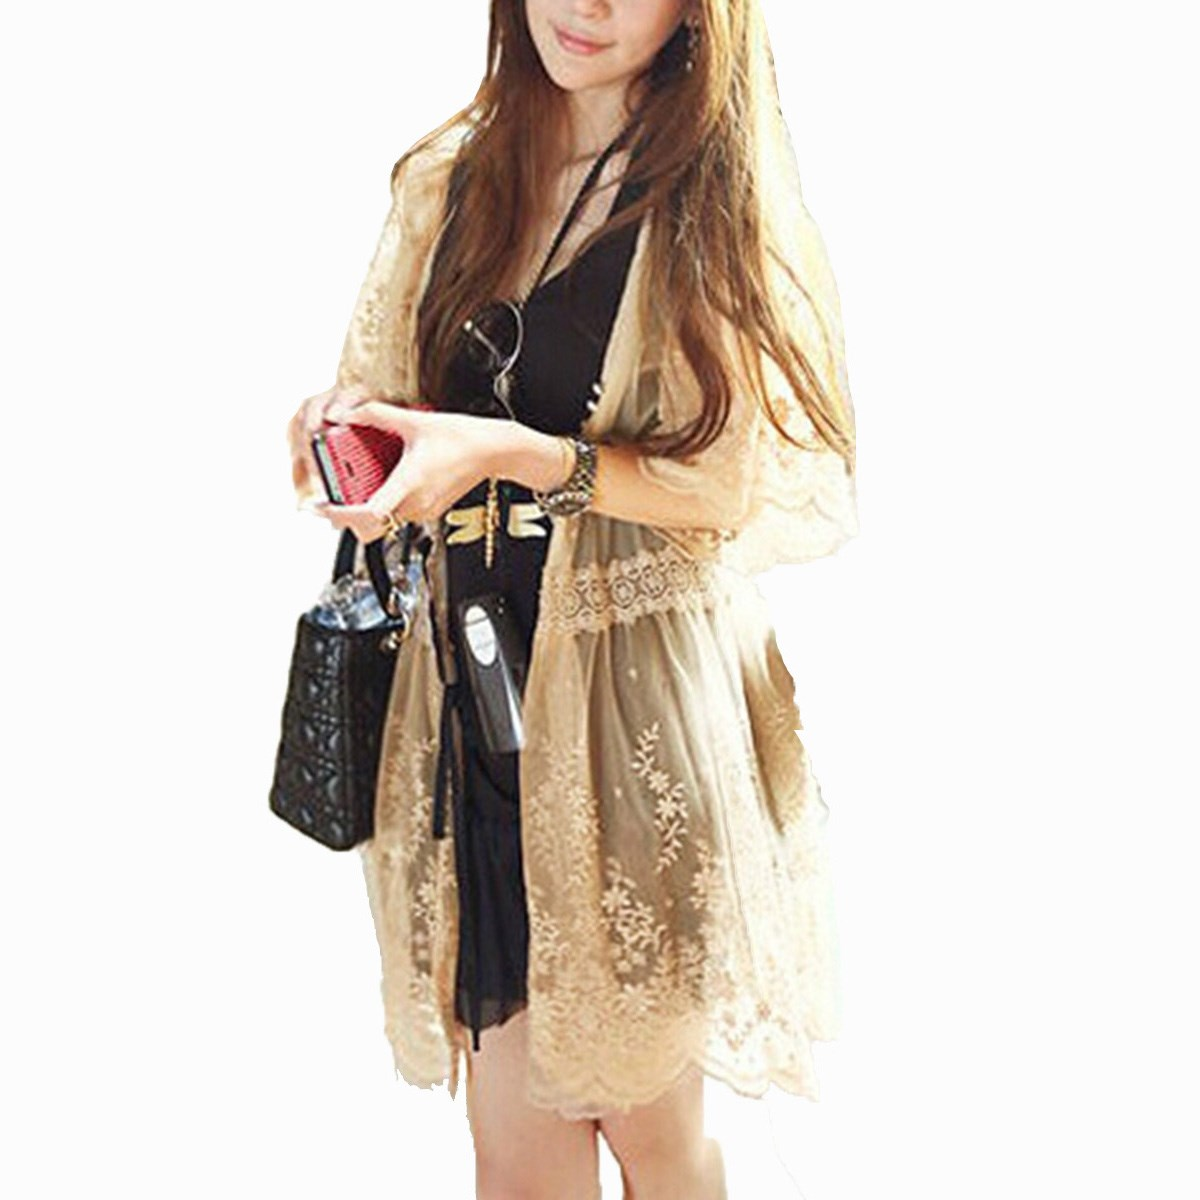 Long lace cardigan - Blusas 2017 Autumn Women Vintage Sheer Lace Floral Crochet Casual Loose Kimono Long Cardigan Blouse Tops